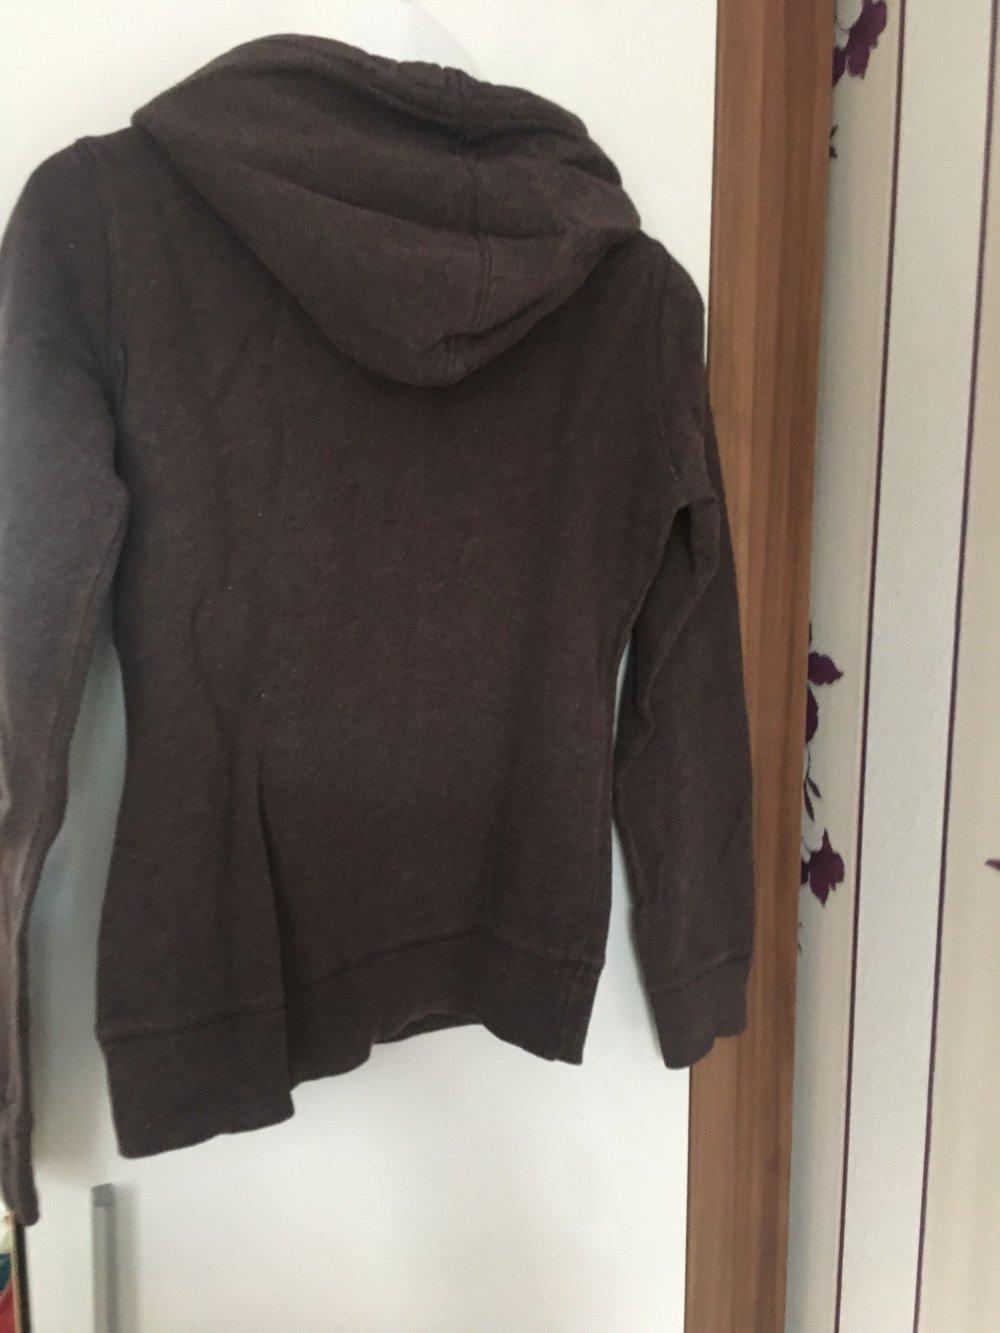 Dunkel Brauner Hoodie In S Sweater Sweatshirt Pulli Pullover